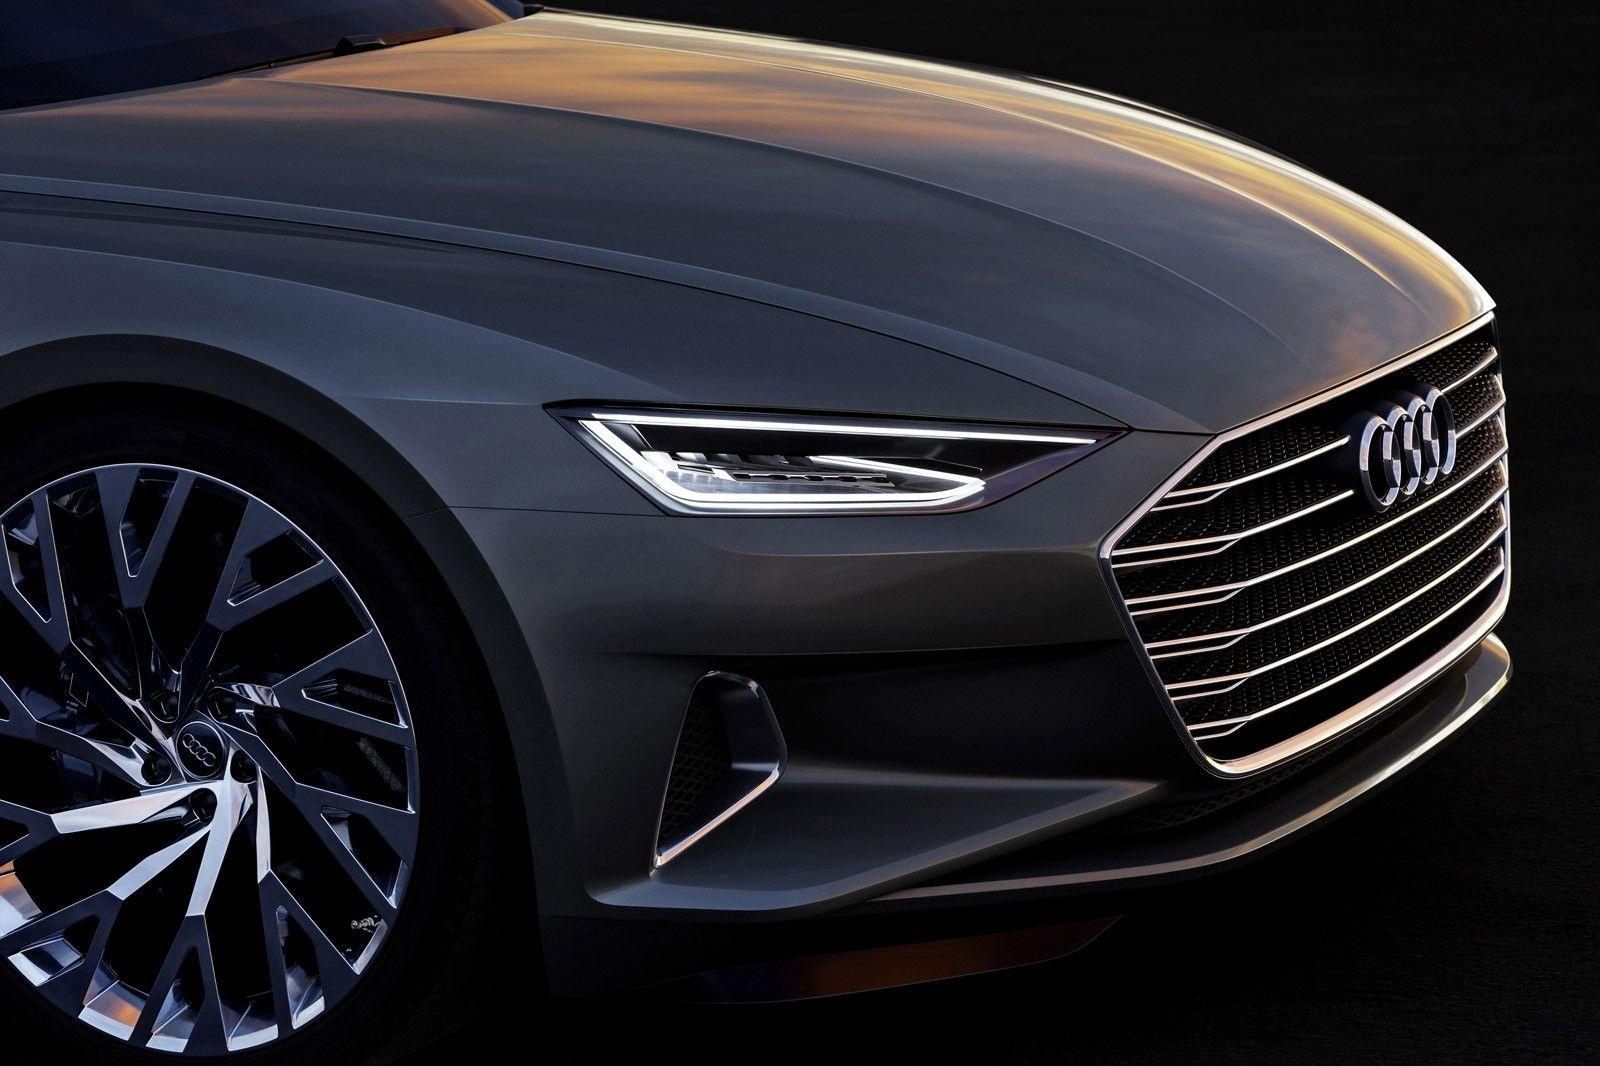 Audi A9 Prologue Price - Optimum Audi